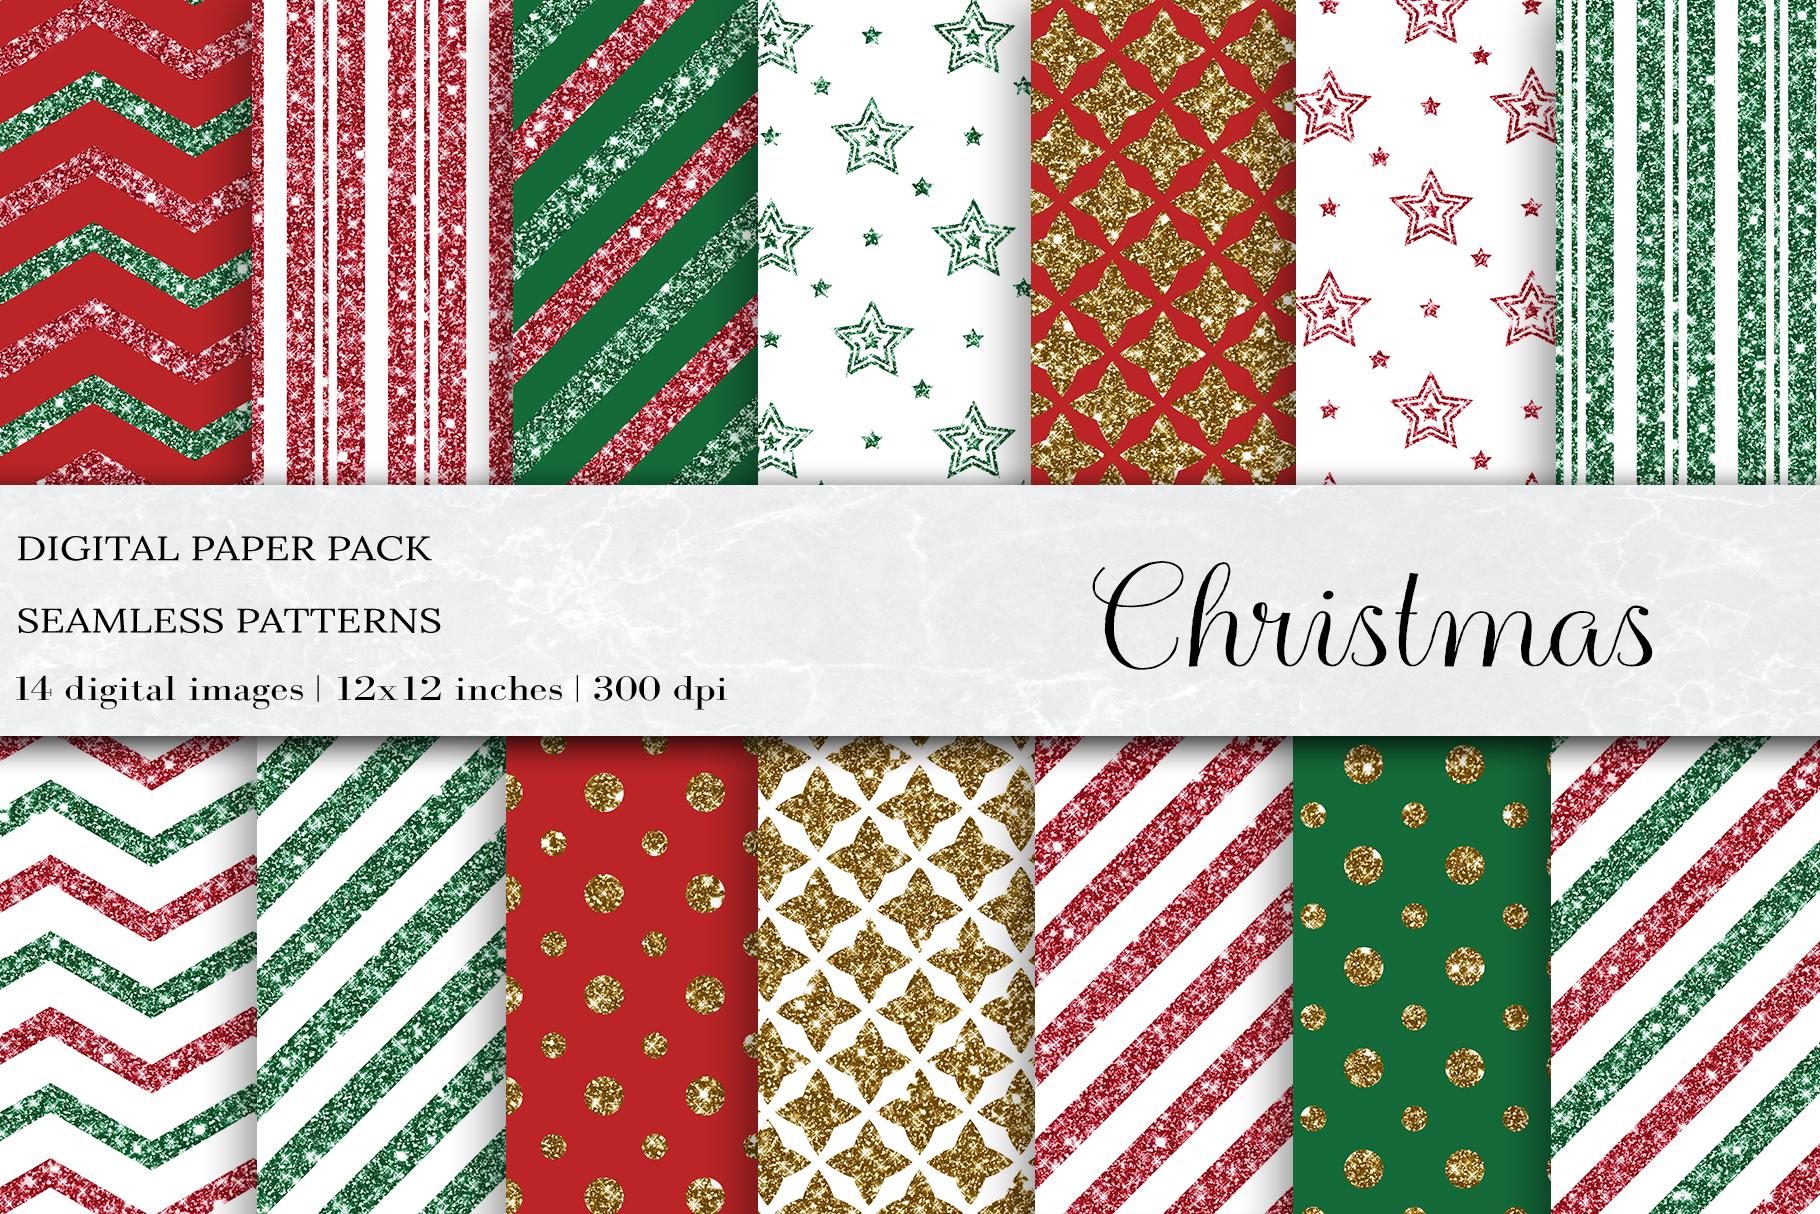 Glitter Christmas Seamless Pattern, Christmas Patterns example image 1